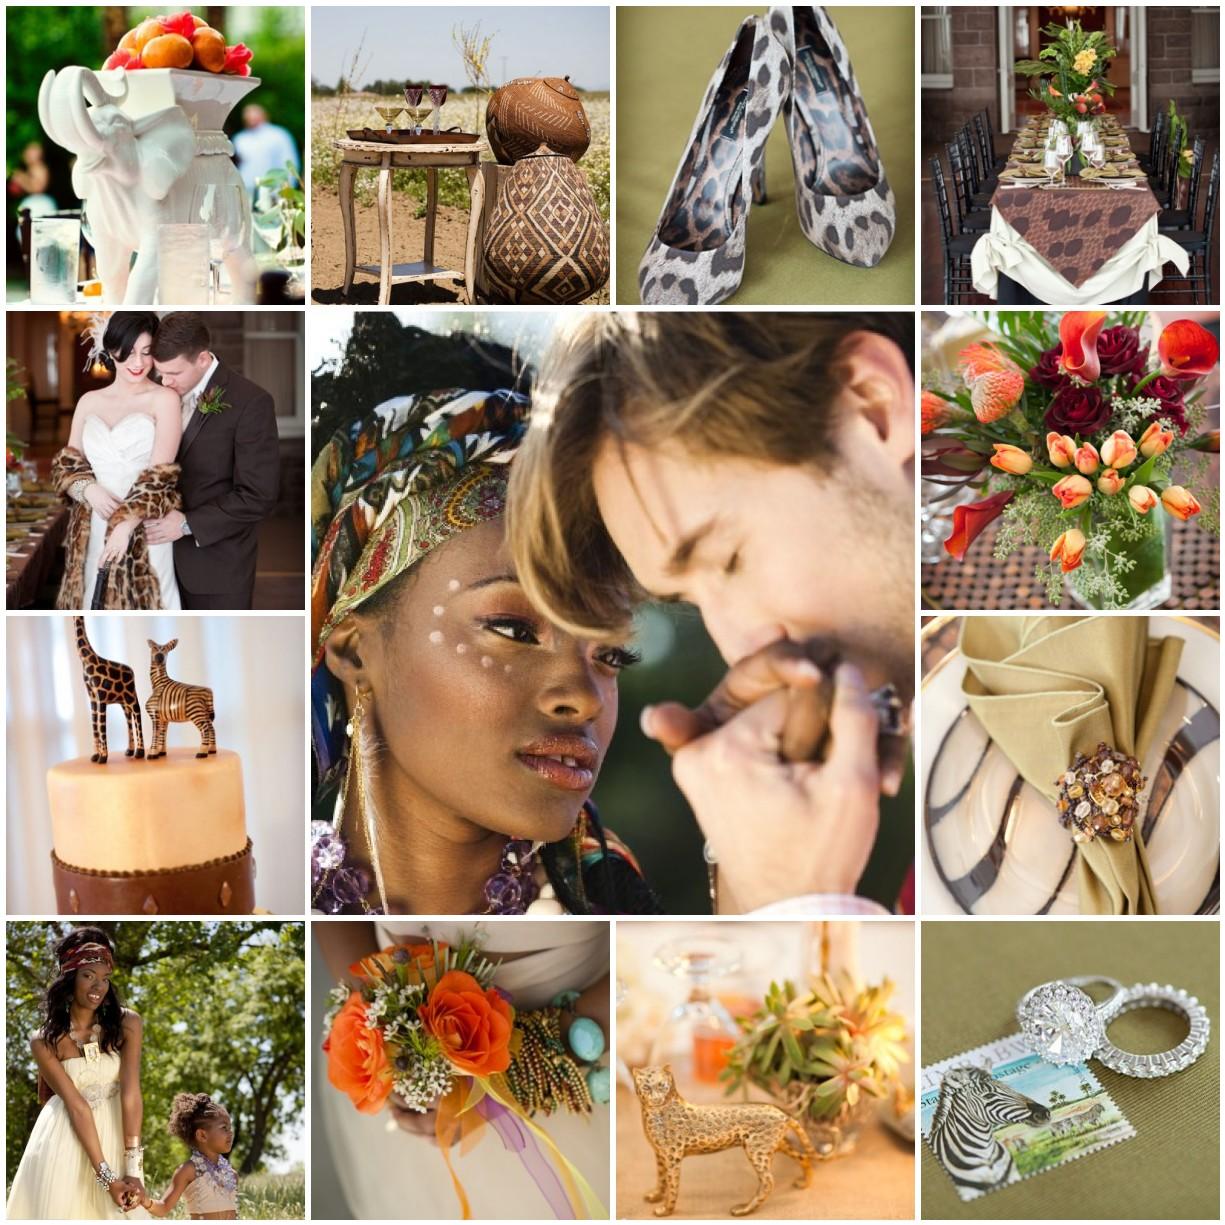 African American Wedding Ideas: The Blushing Bride